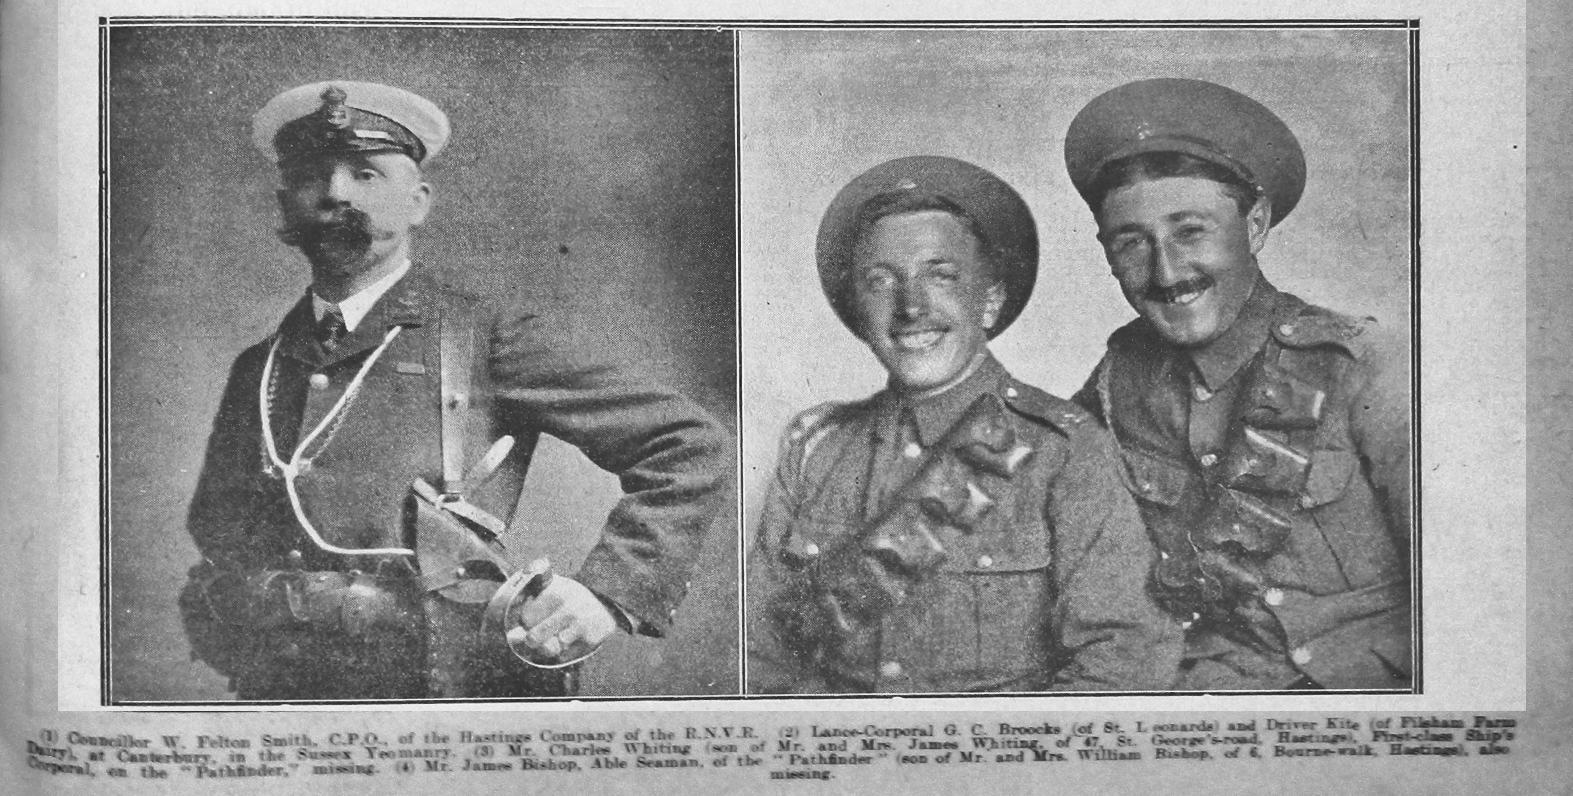 Felton Smith, Broocks & Kite